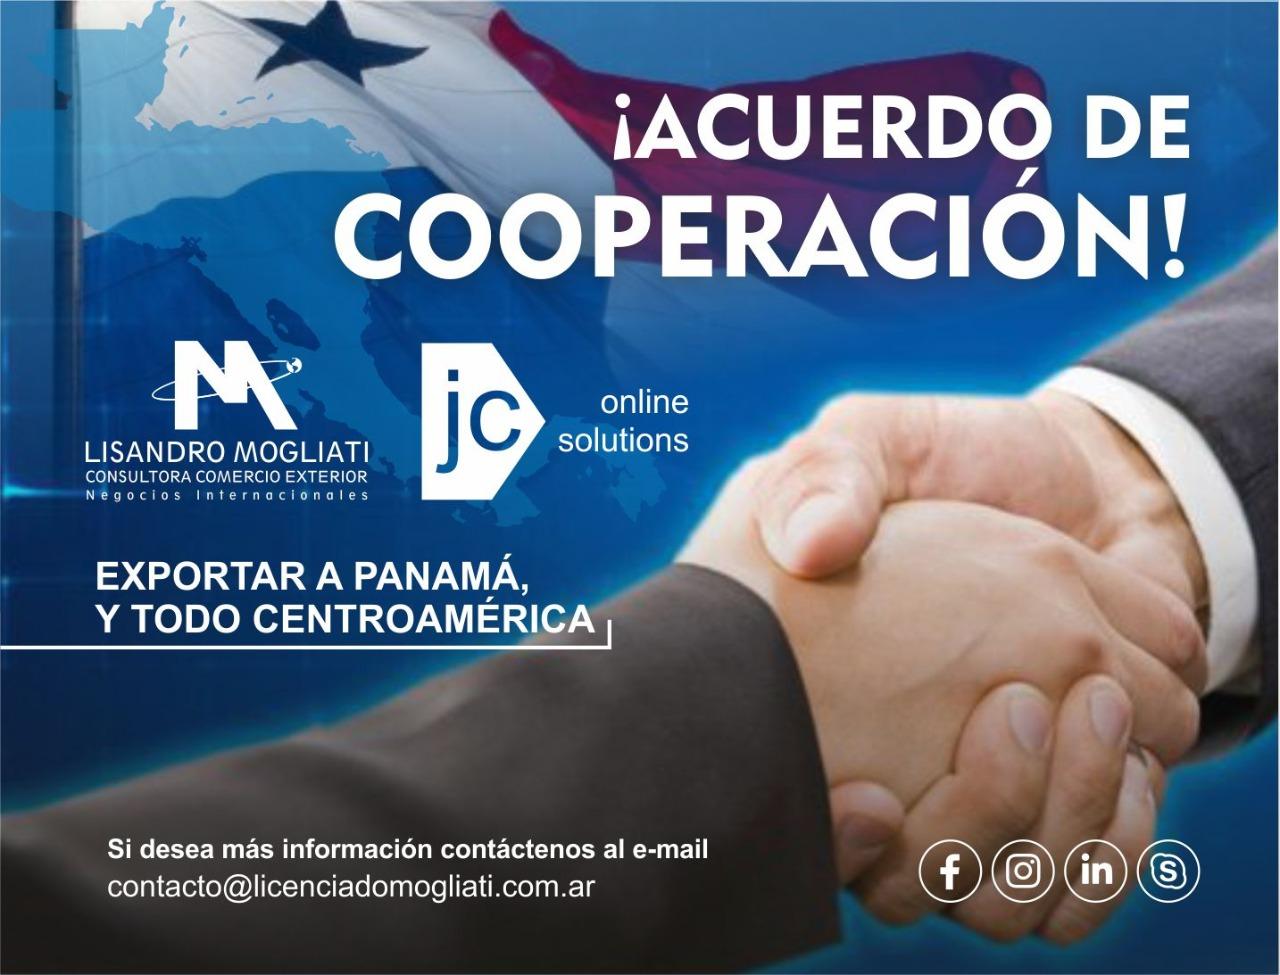 Lisandro Mogliatti y JC ONline Solutions unen esfuerzos